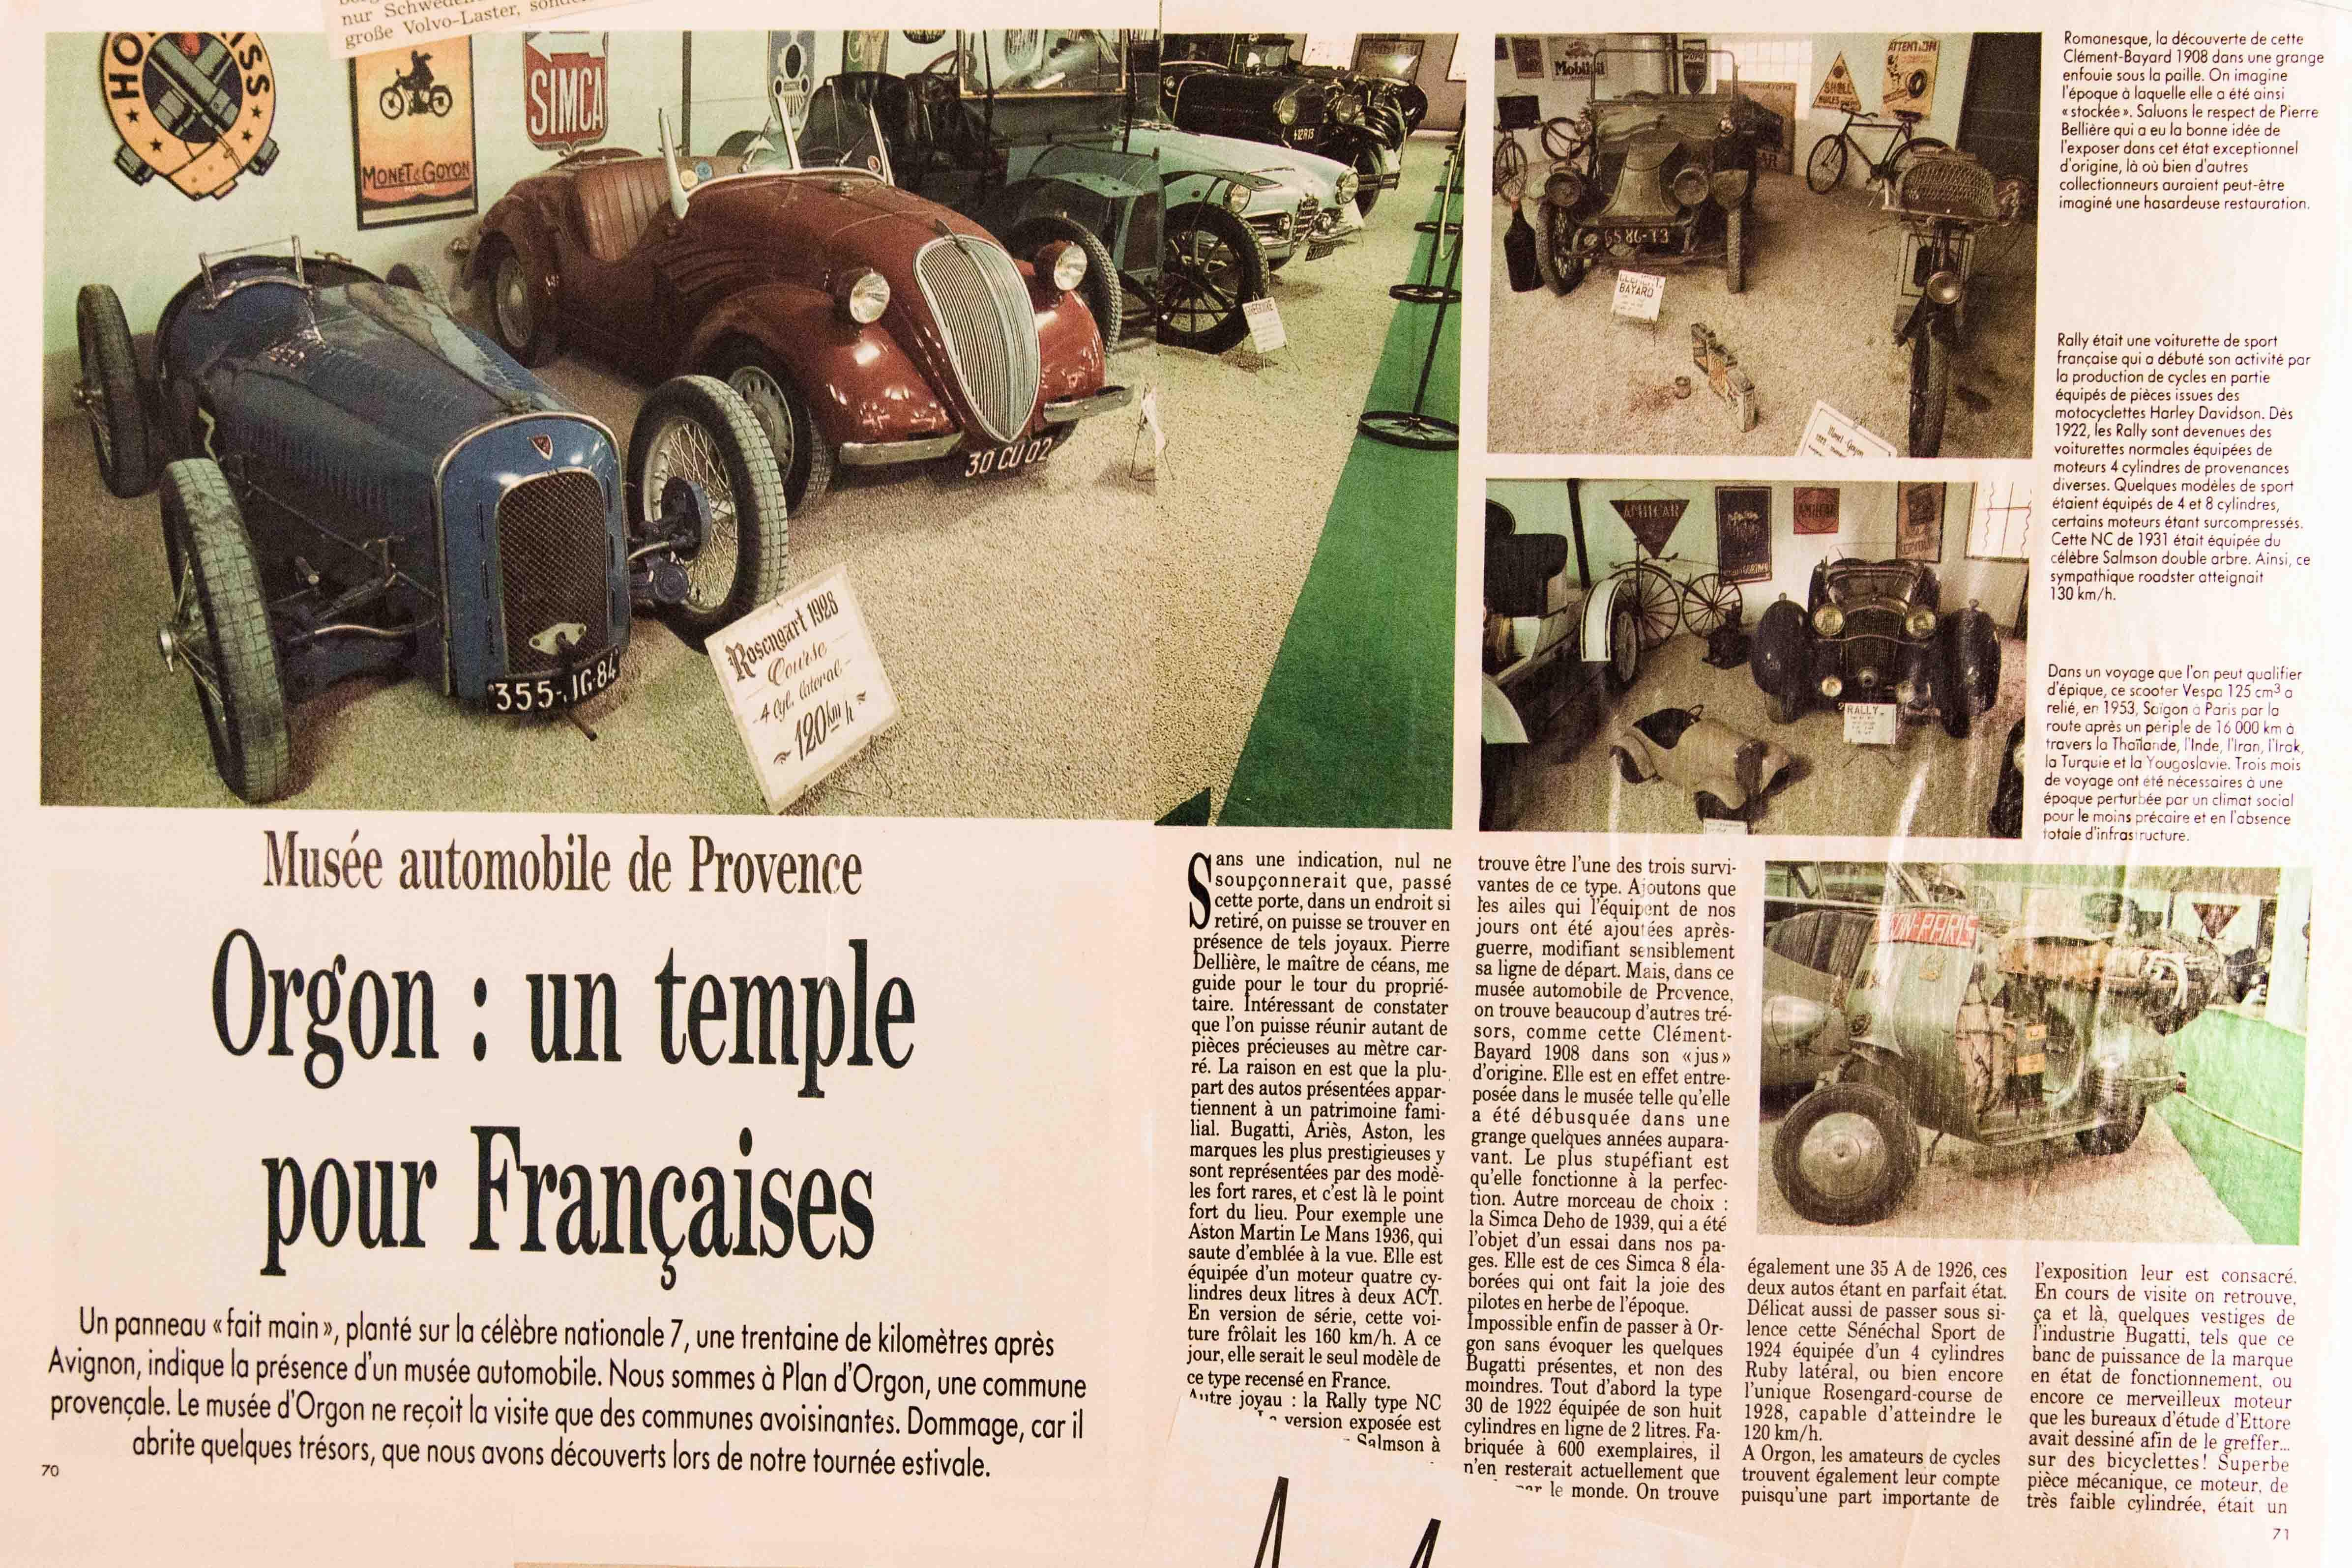 1995 - Musée Automobile de Provence